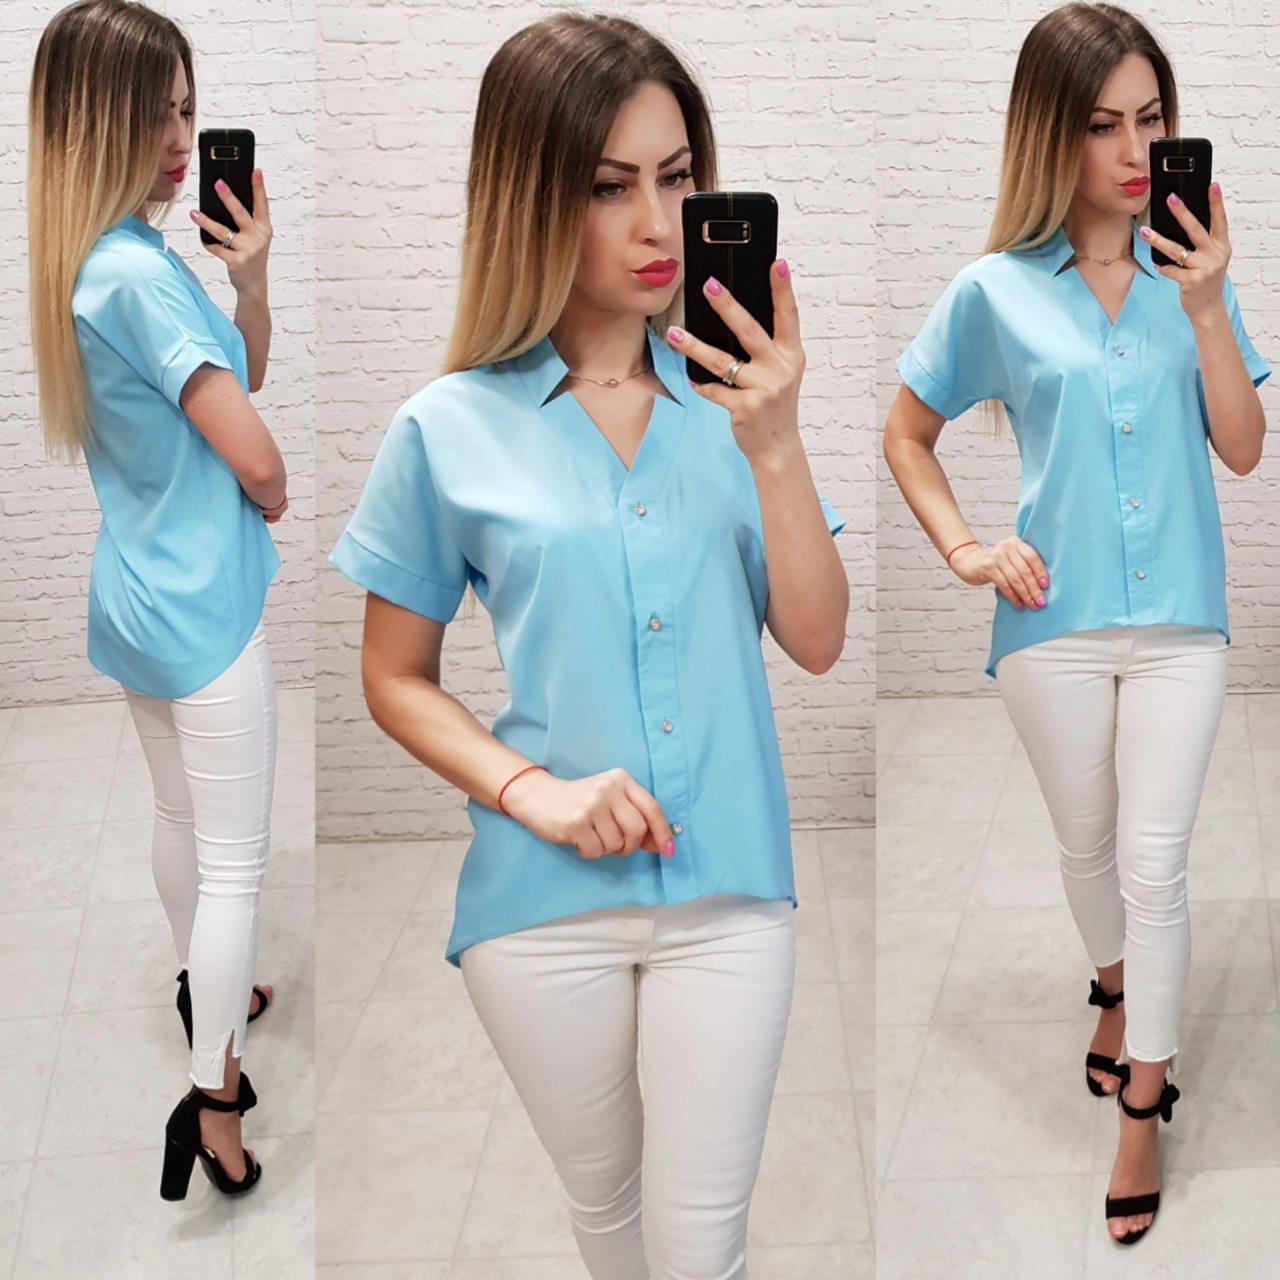 Блузка с коротким рукавом, арт. 160, цвет, голубой